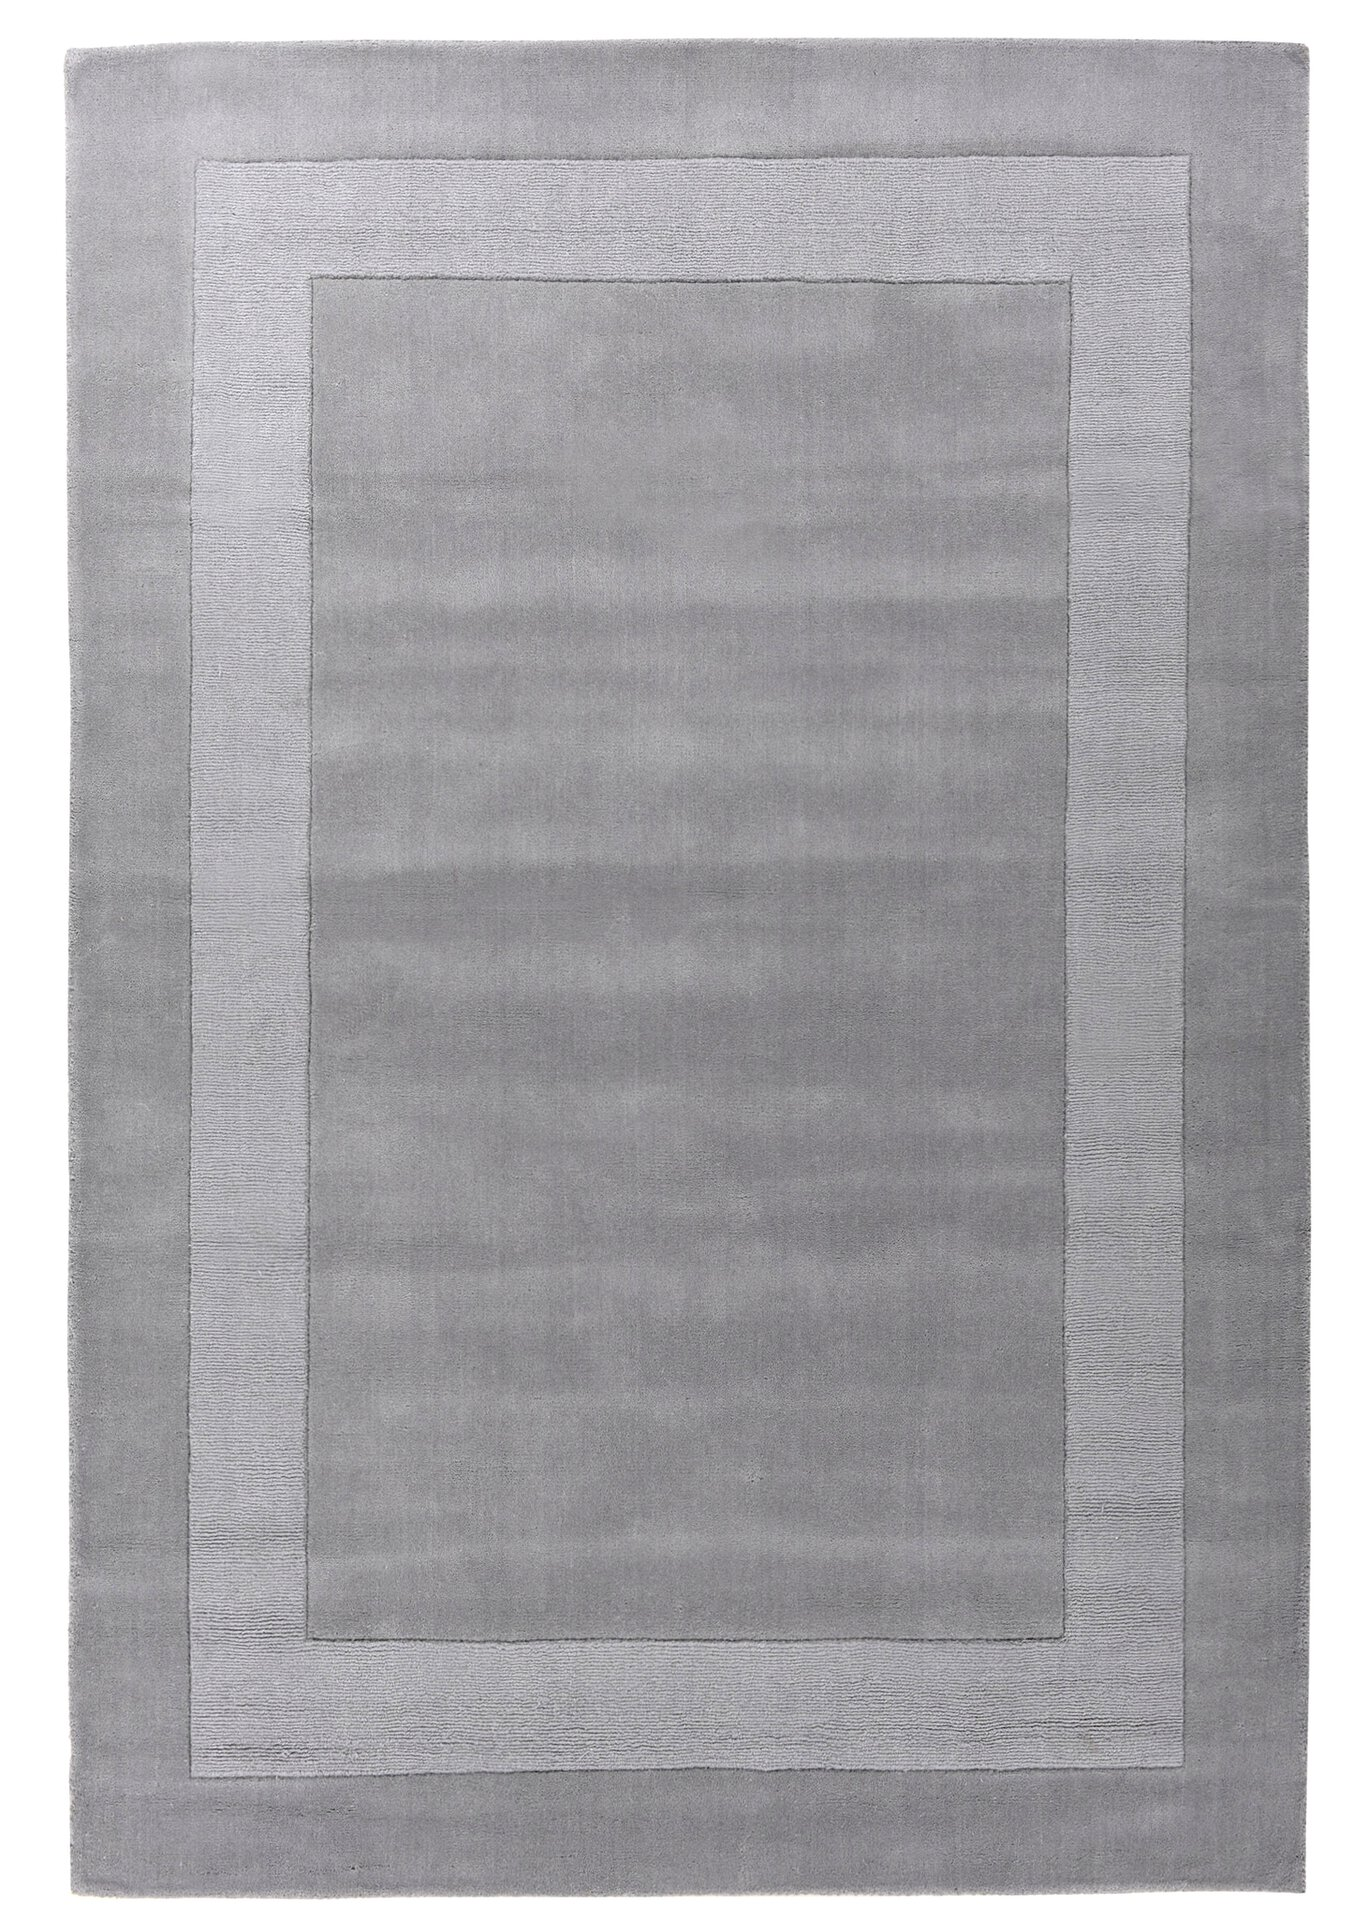 Handtuftteppich Usedom Theko Textil grau 1 x 1 cm